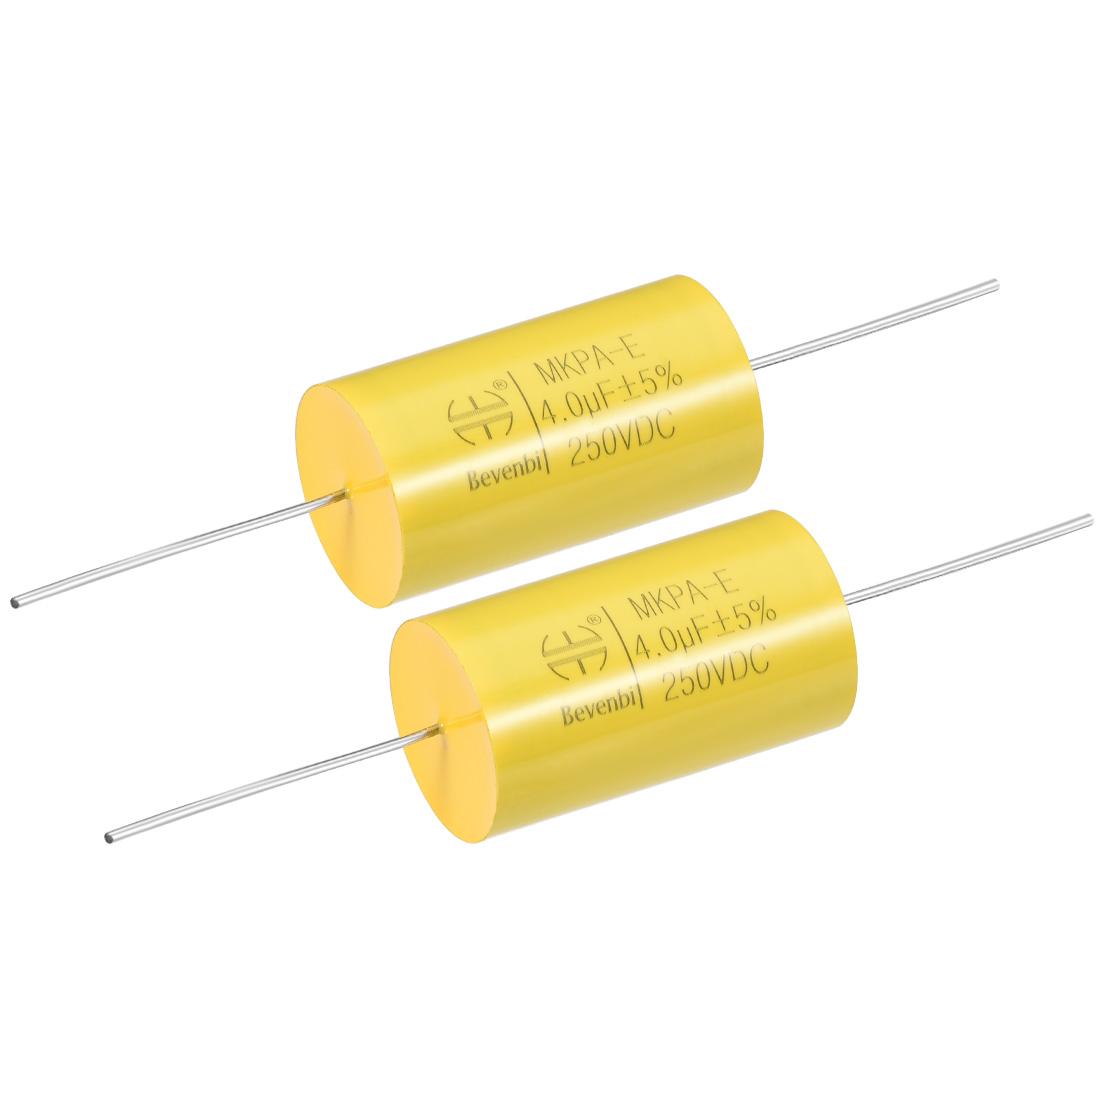 Film Capacitor 250V DC 4.0uF MKP-E Round Polypropylene Capacitors Yellow 2pcs